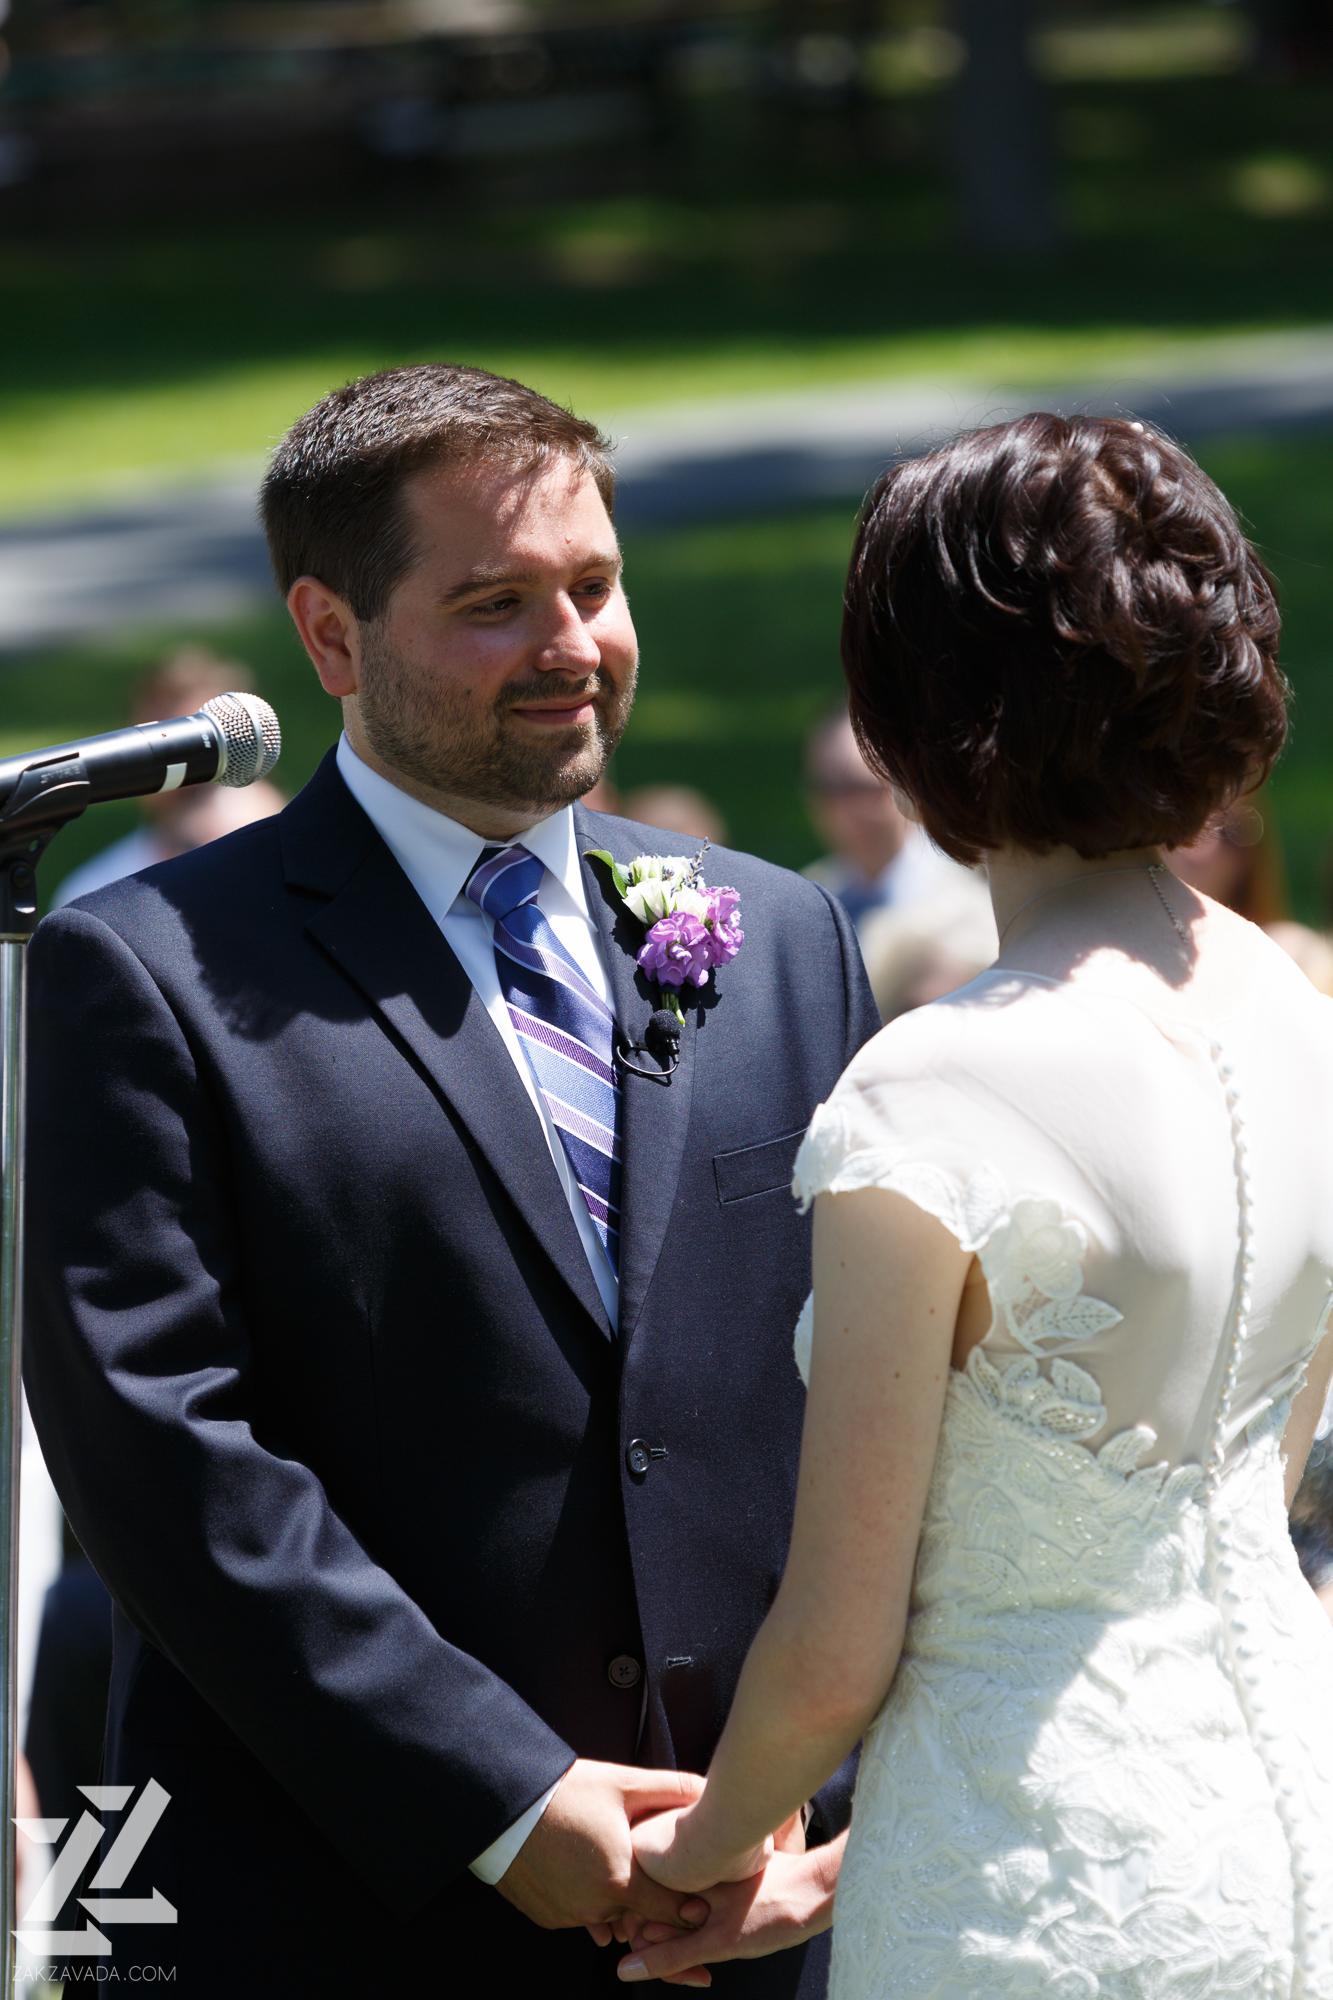 scranton-wedding-photography-zak-zavada-ruddyBelcastroWedding-311.jpg